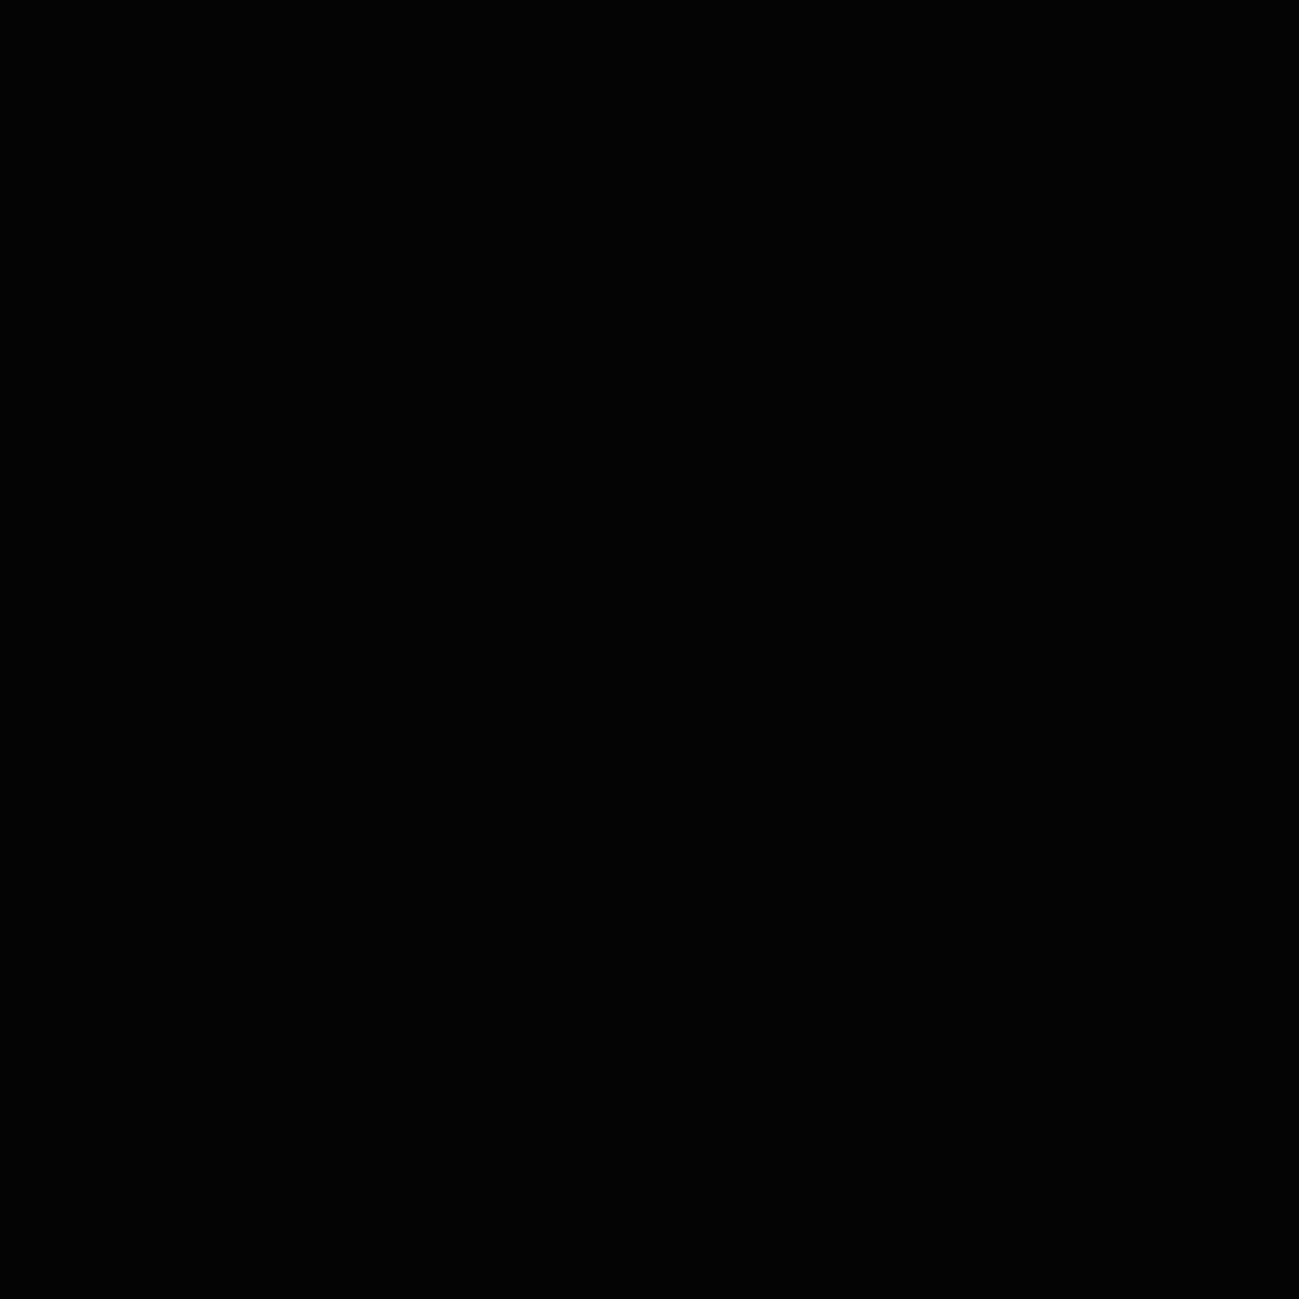 Smalto spray base solvente DUPLI COLOR Sprayplast 0.0075 L nero opaco - 2